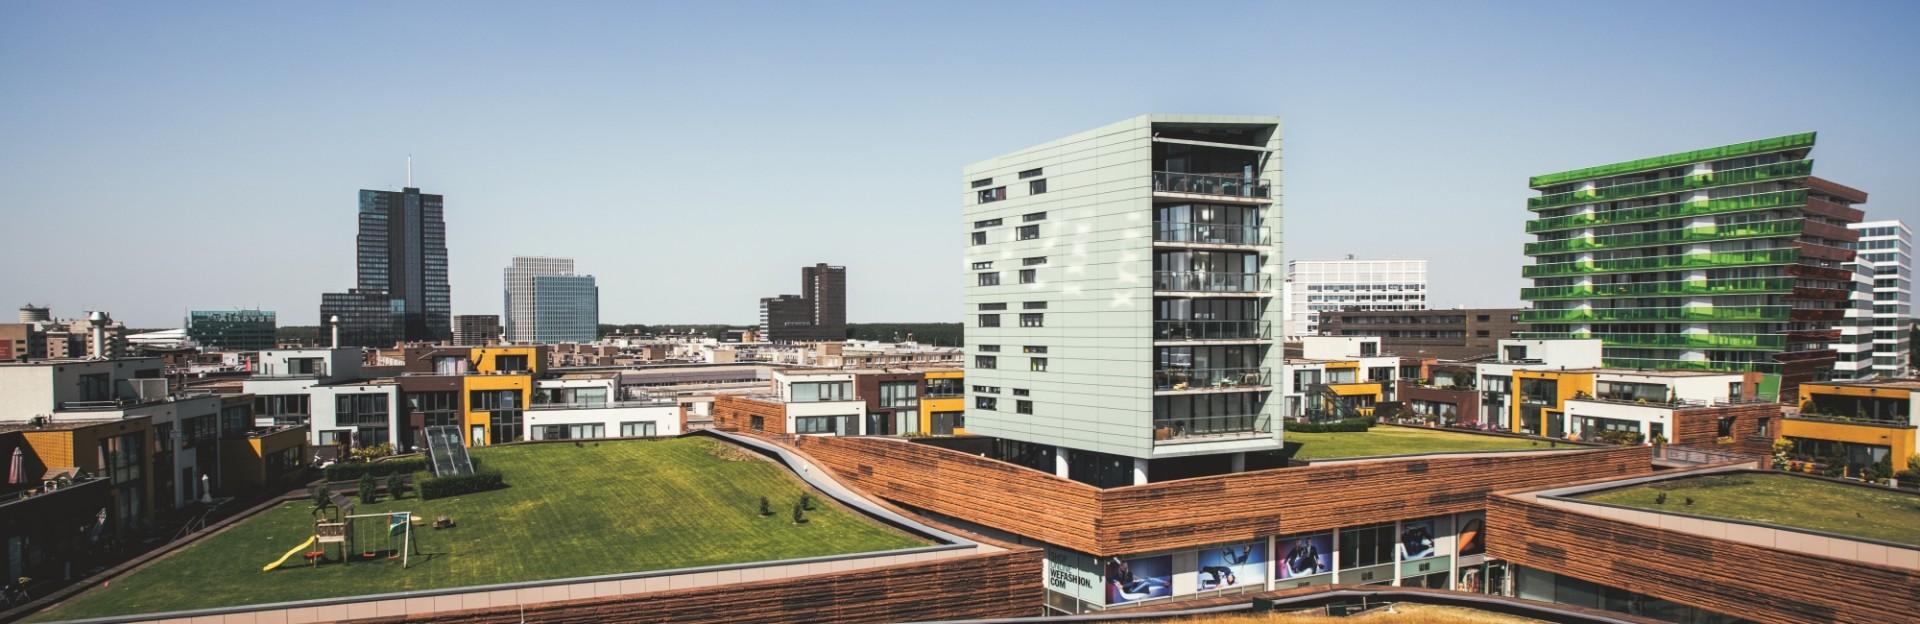 metropool-amsterdam-almere-city-marketing